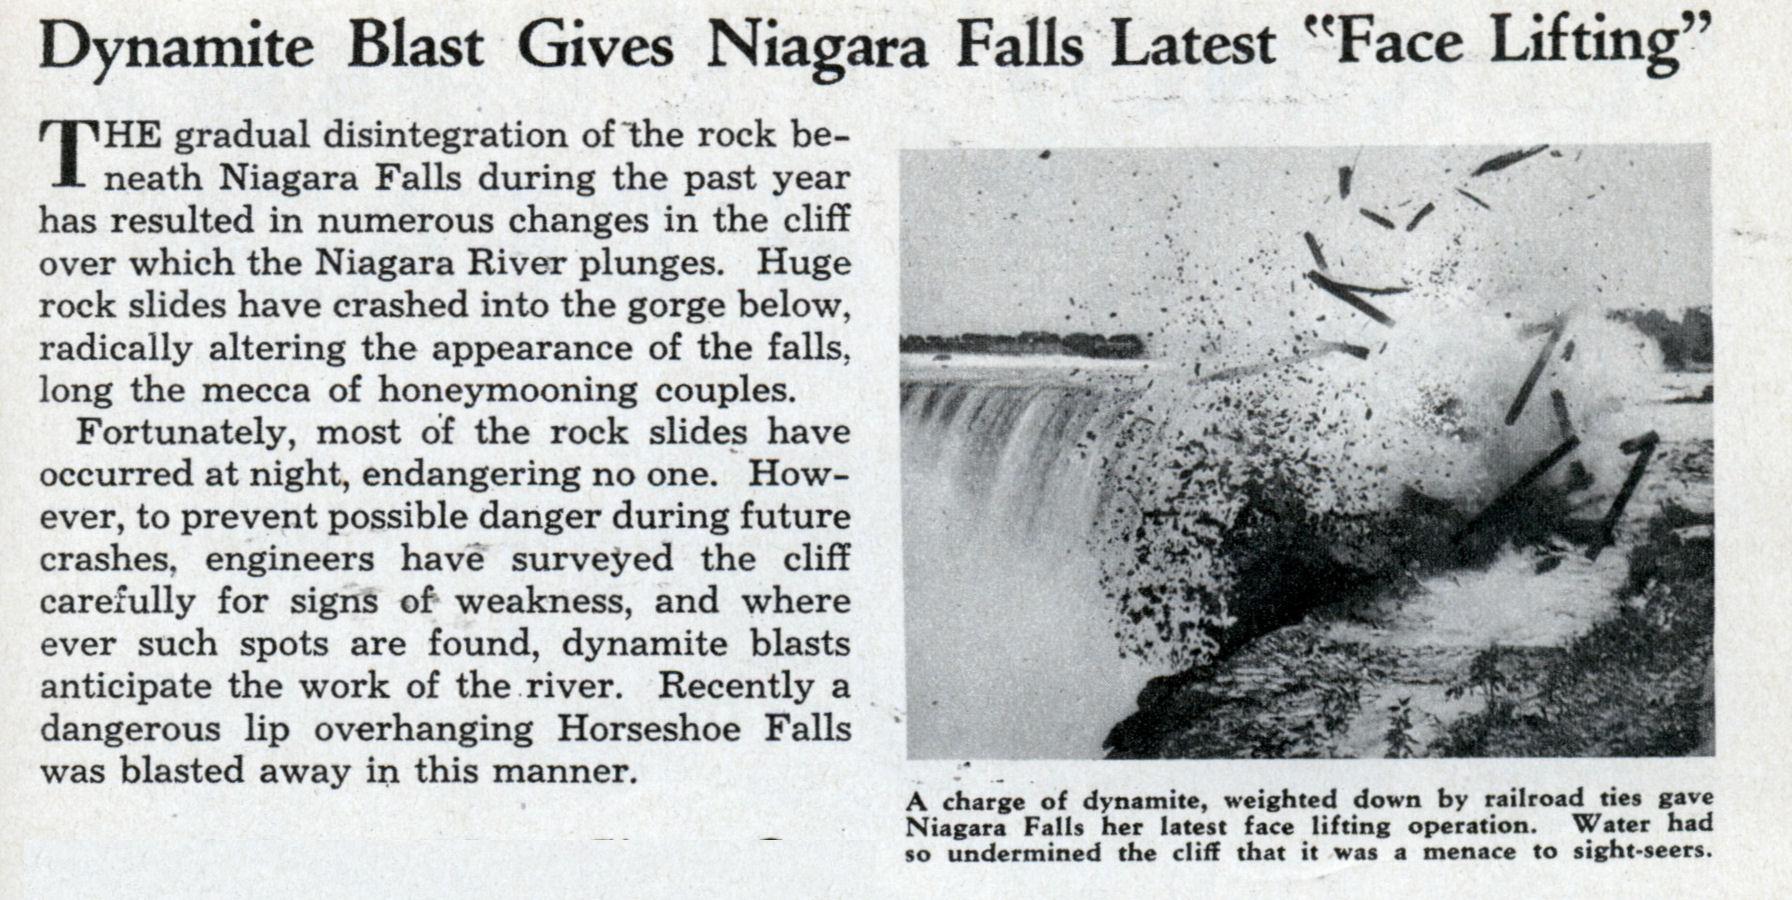 Dynamite Blast Gives Niagara Falls Latest Face Lifting